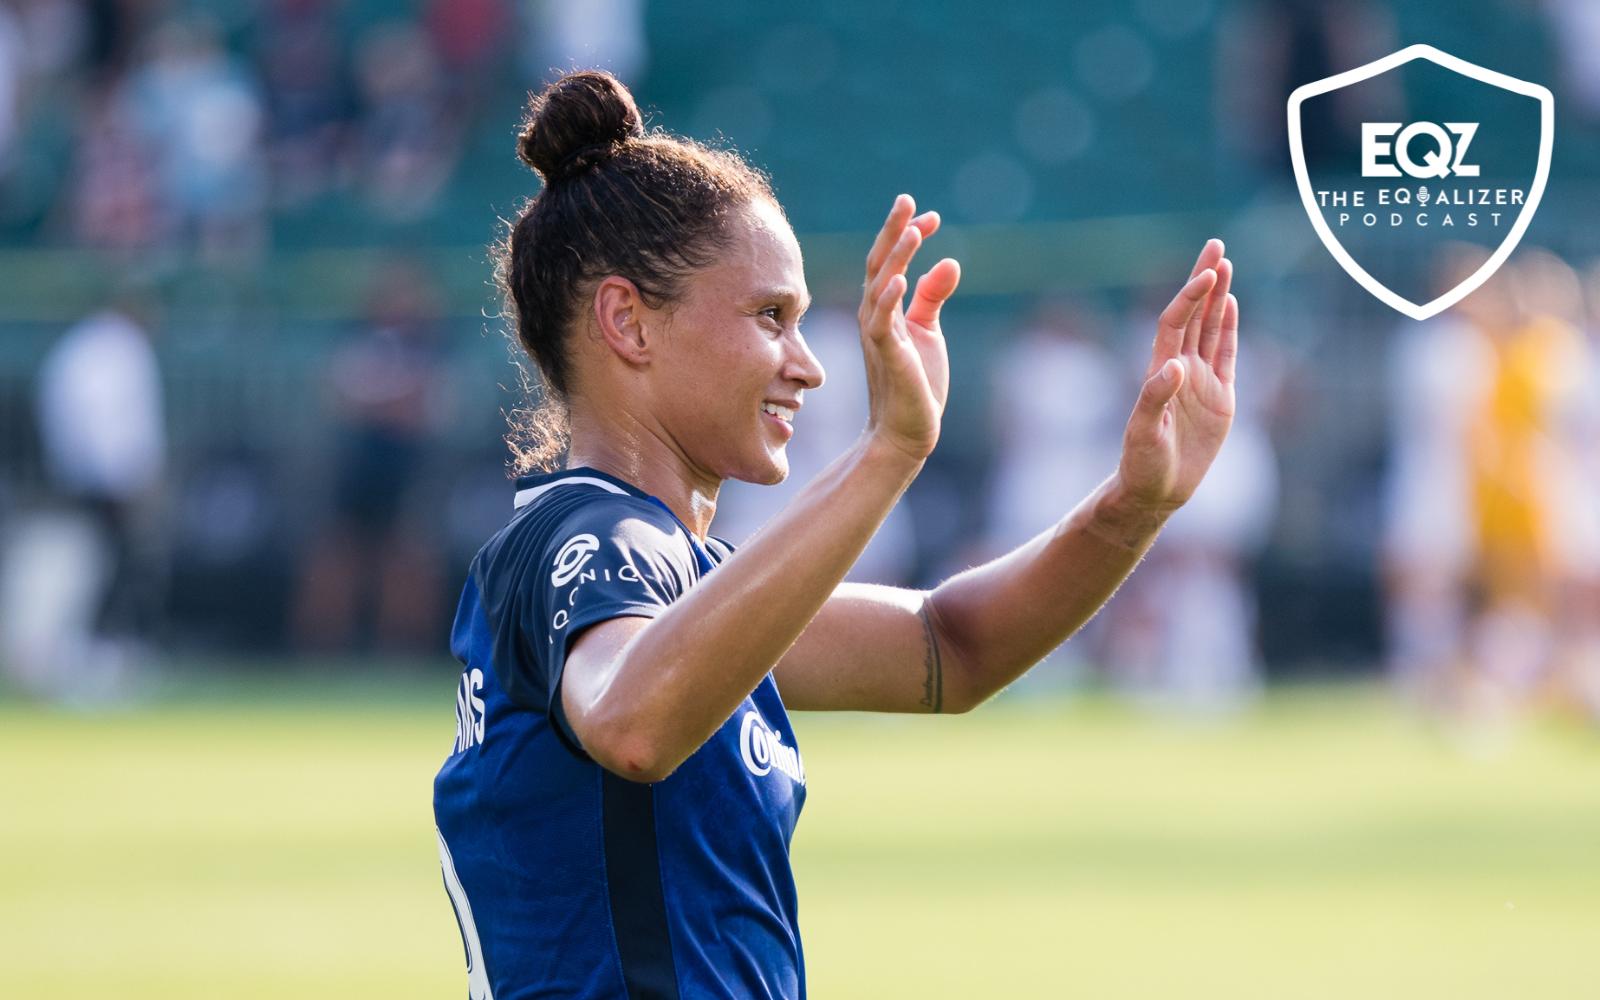 North Carolina Courage forward Lynn Williams celebrates after scoring a goal.